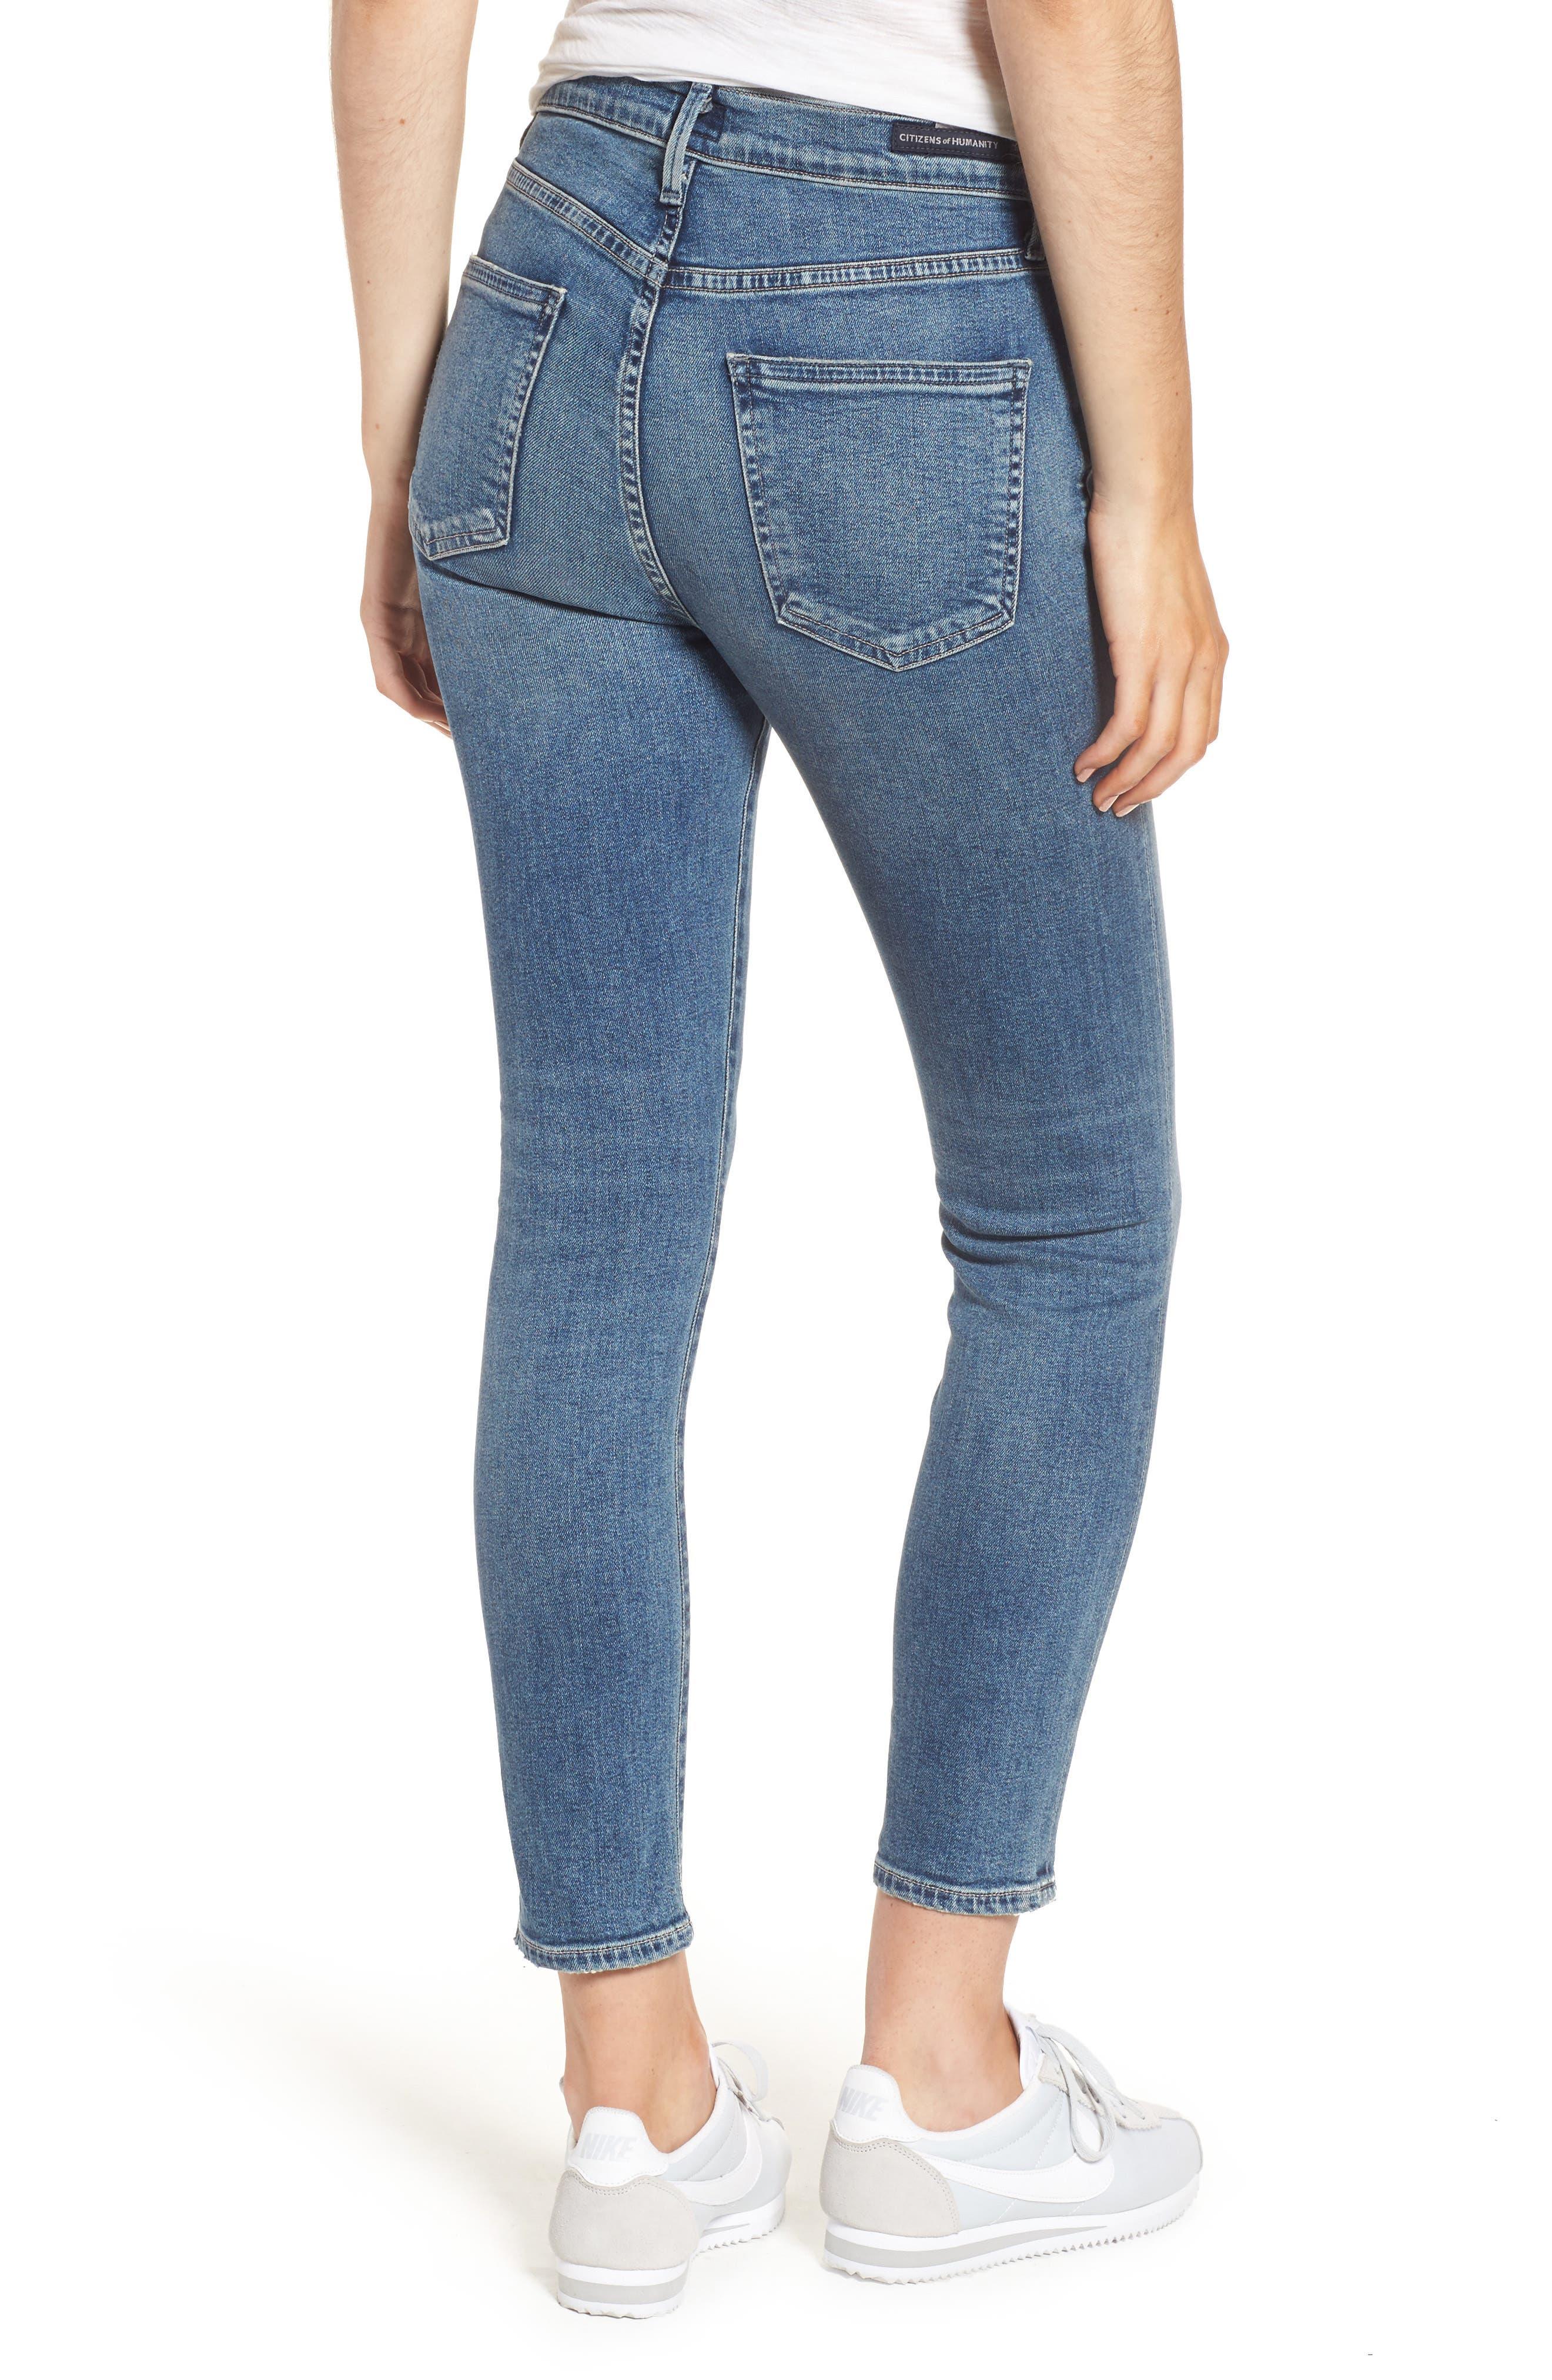 Rocket Crop Skinny Jeans,                             Alternate thumbnail 2, color,                             Orbit